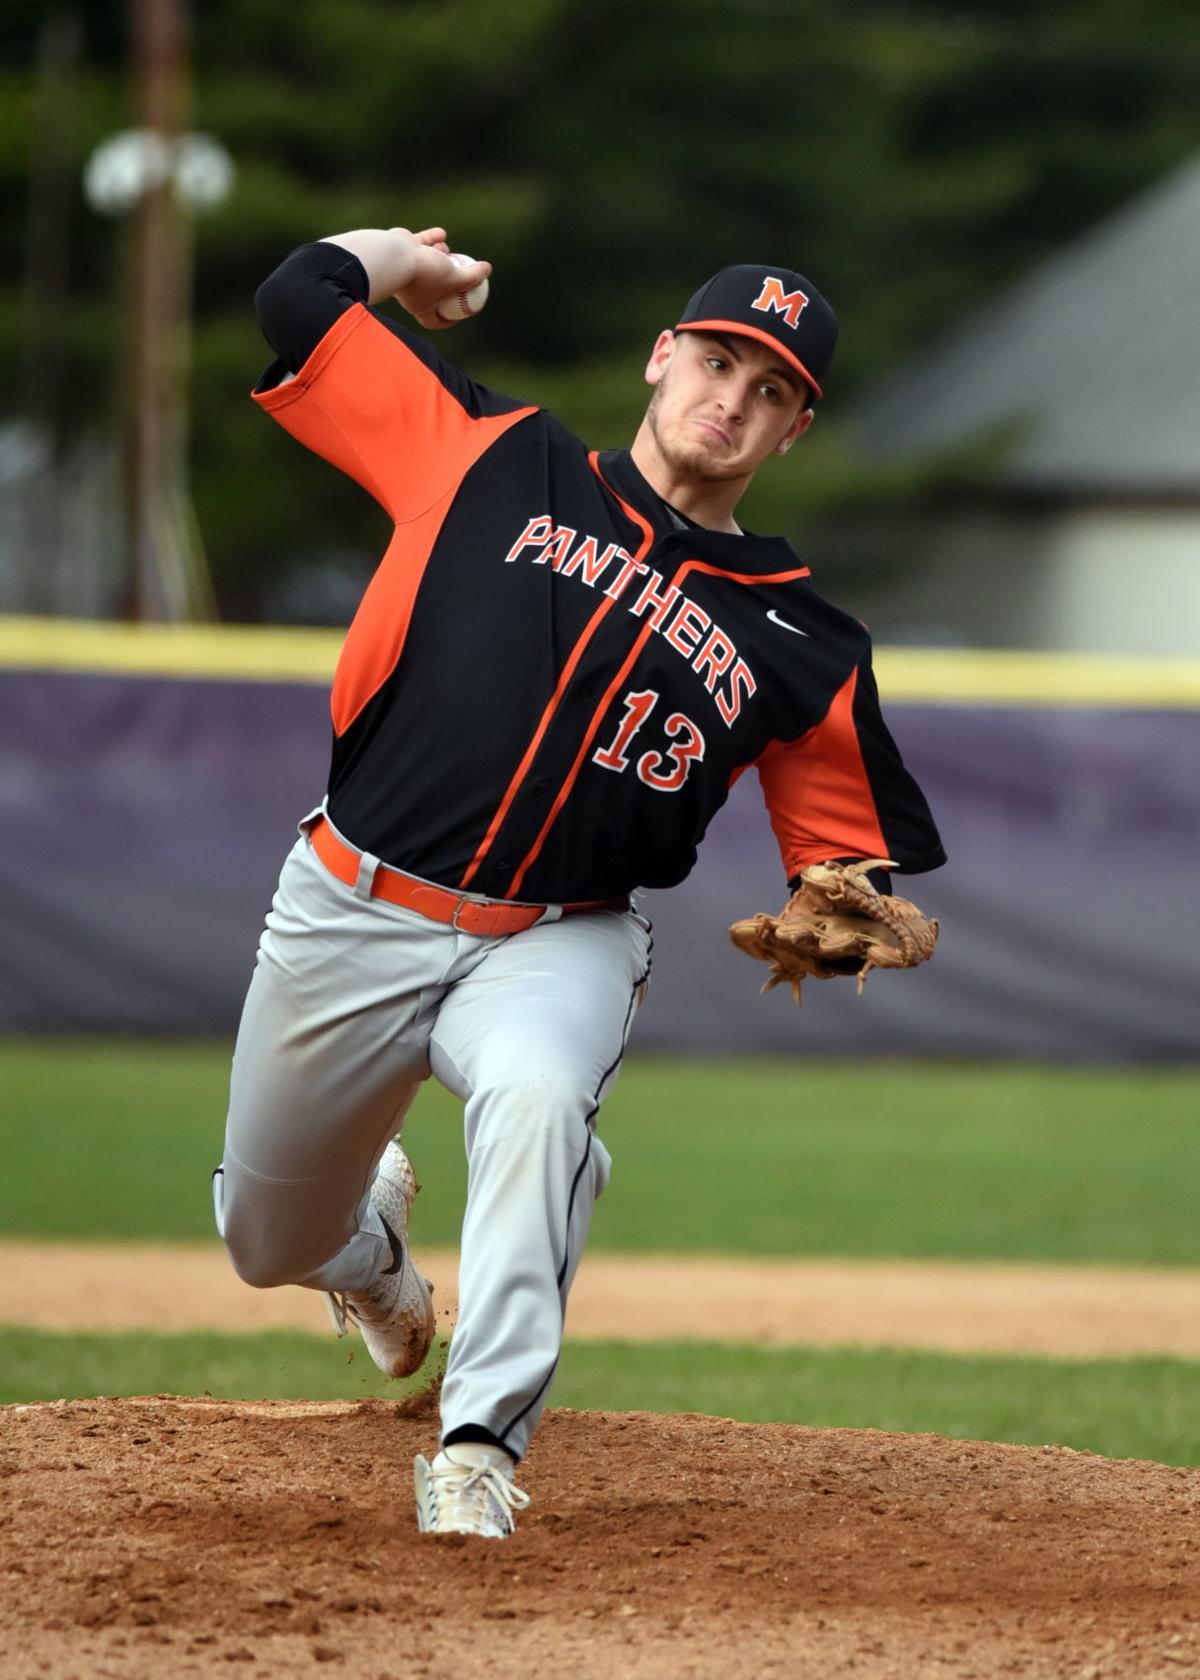 H.S. Roundup: Milton versus Shamokin baseball